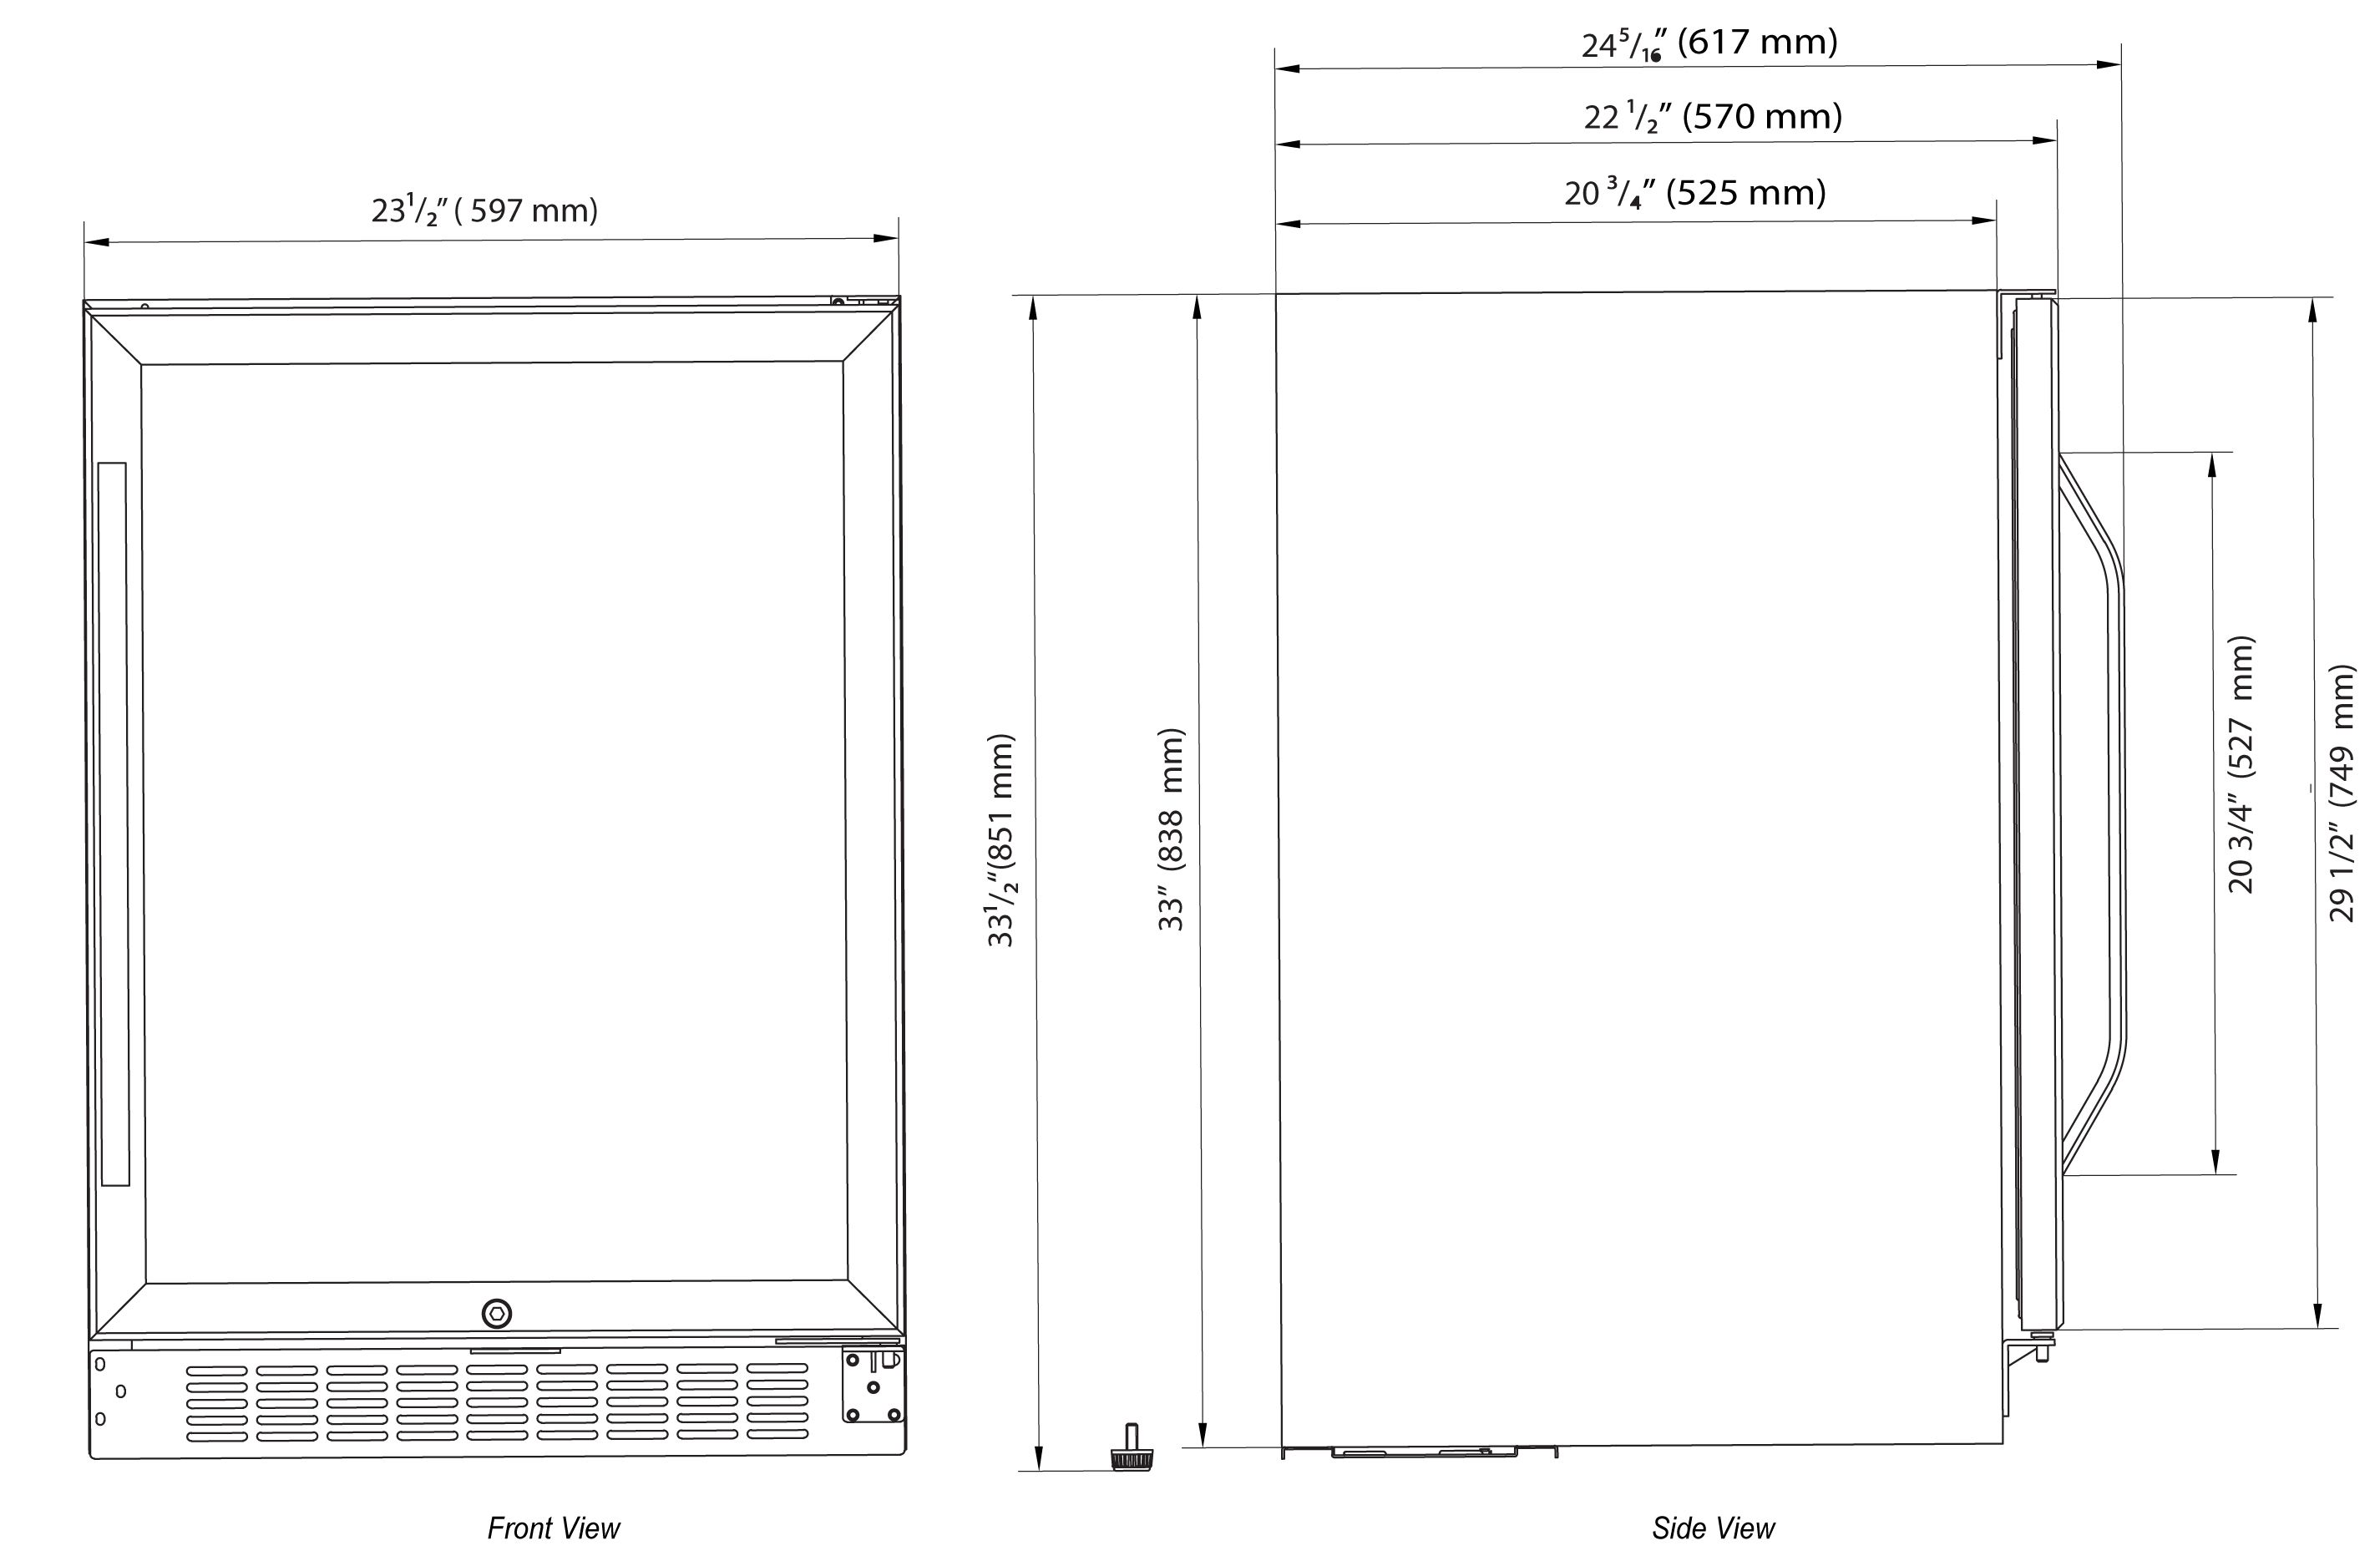 hight resolution of edgestar wiring diagram wiring diagram data val edgestar wiring diagram